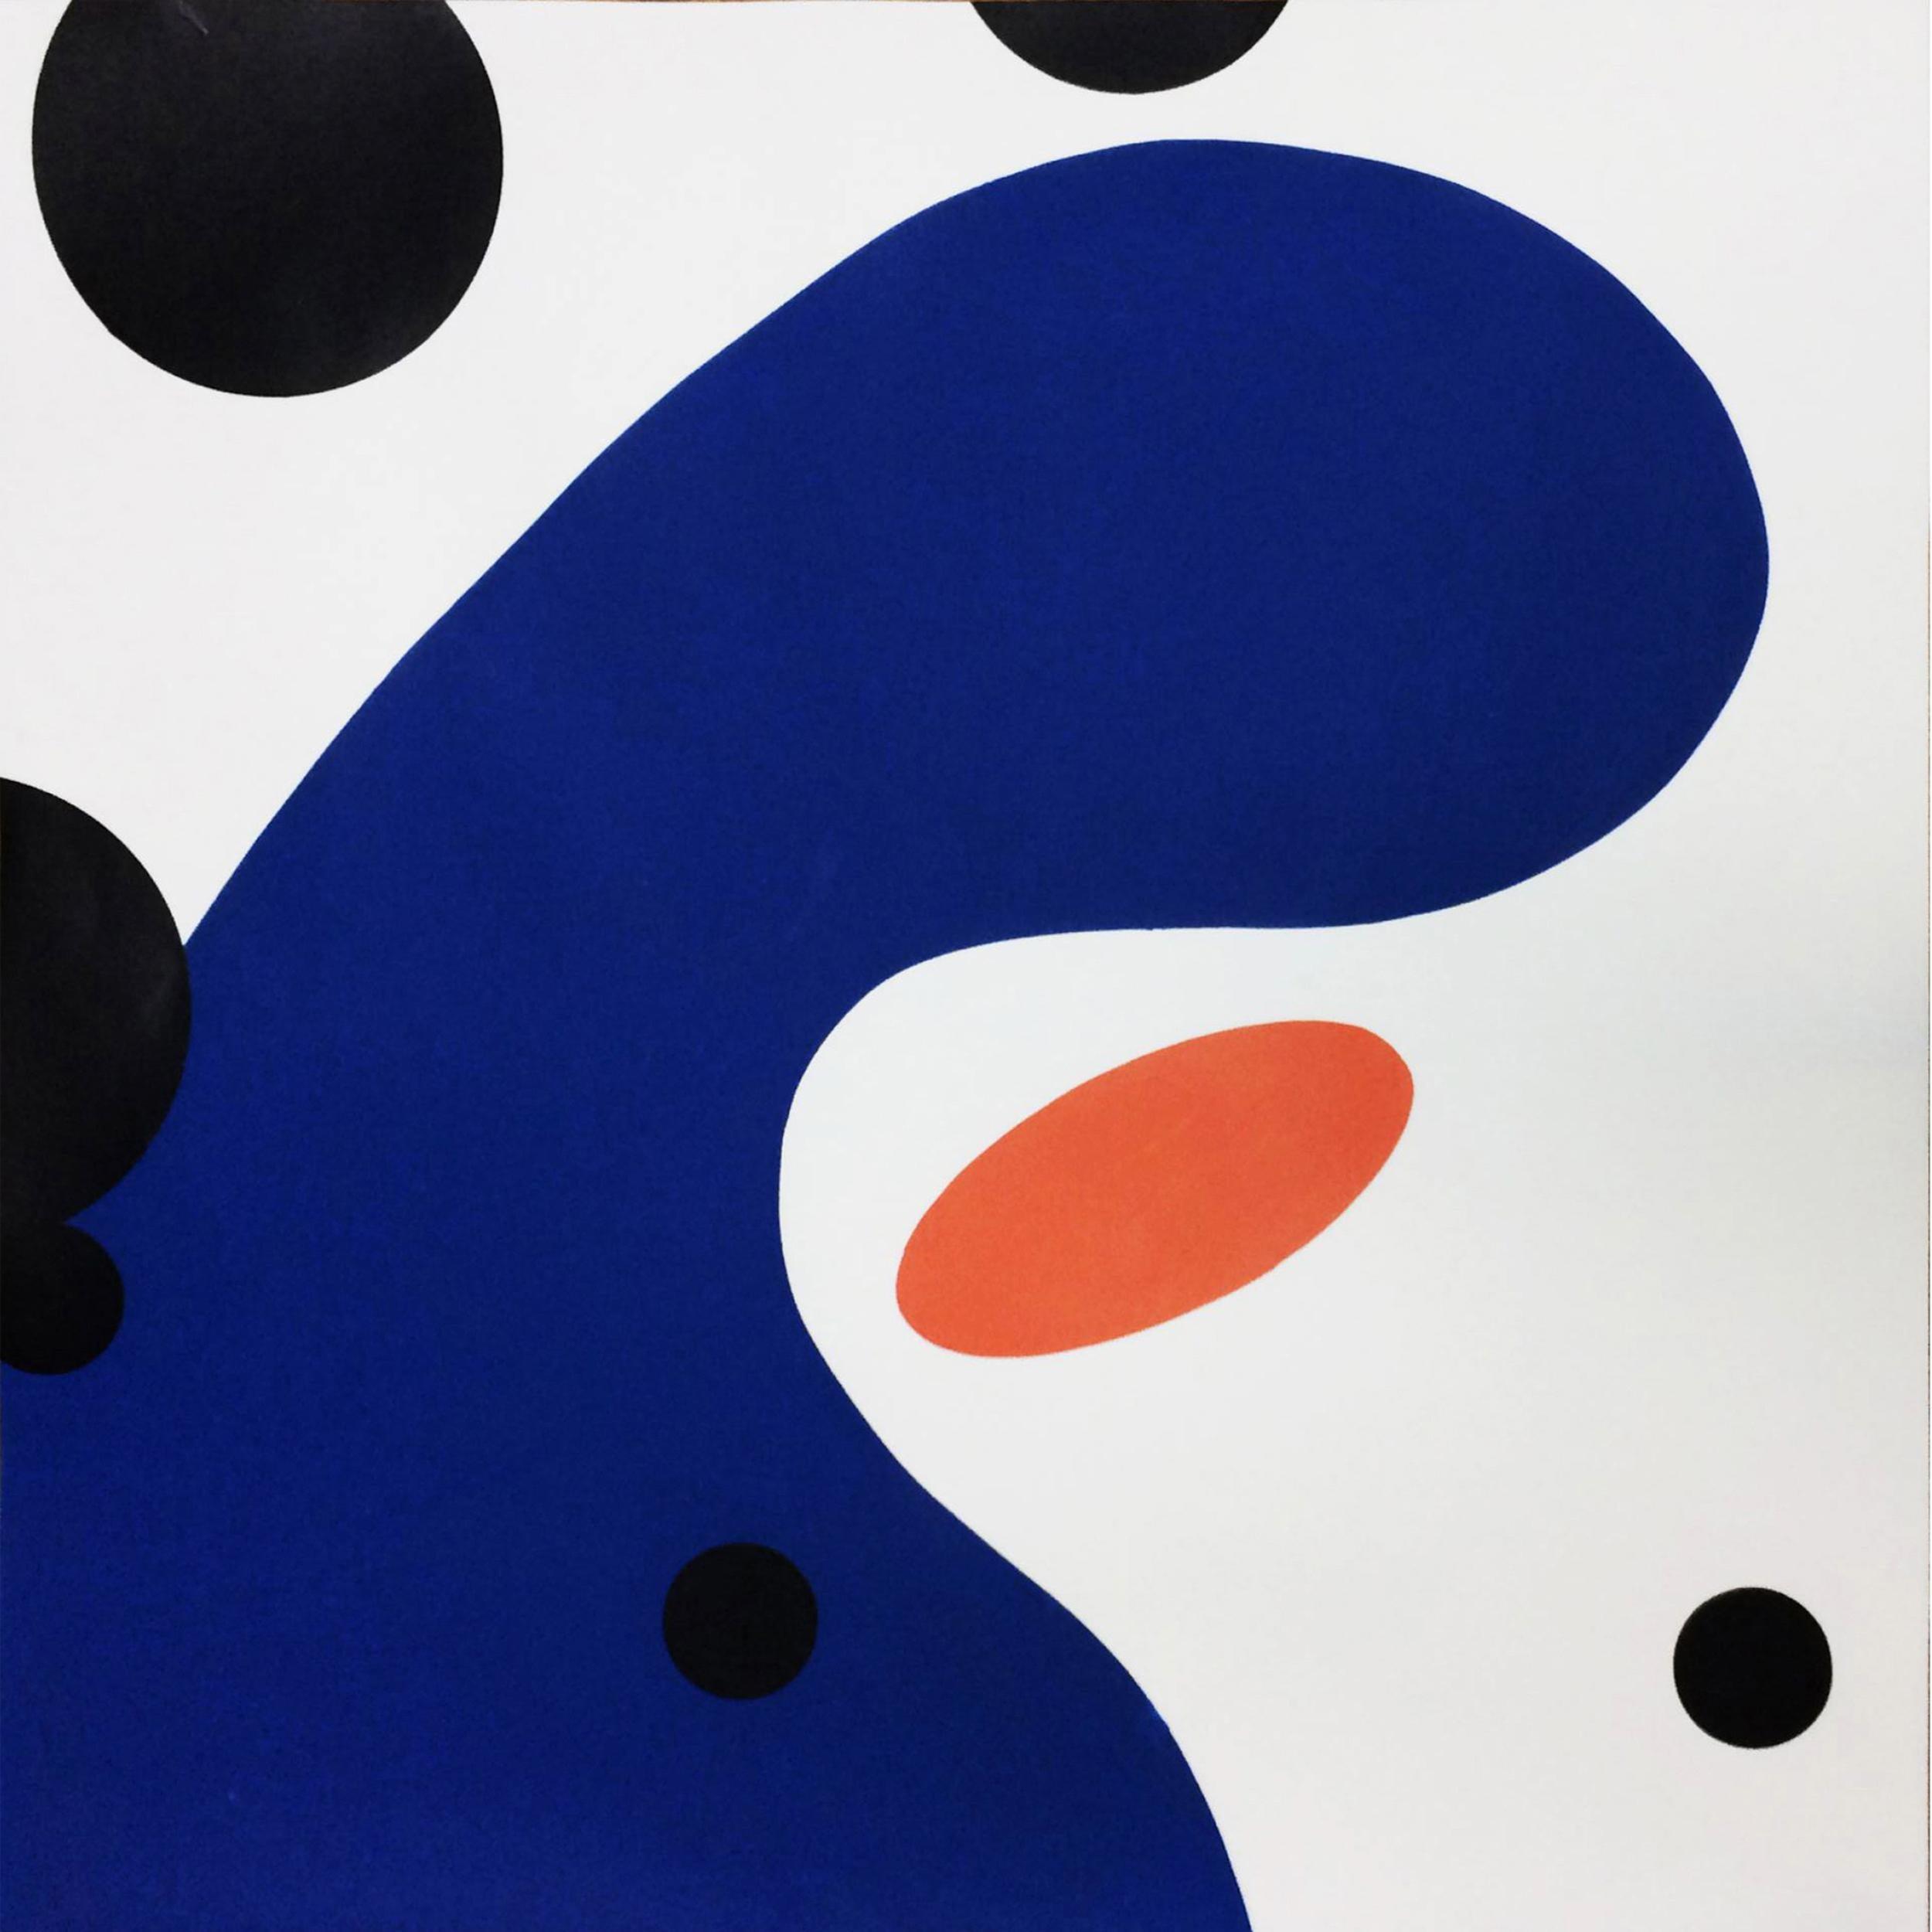 Cooperative Kinetics #16, blue, orange & black abstract monoprint on paper